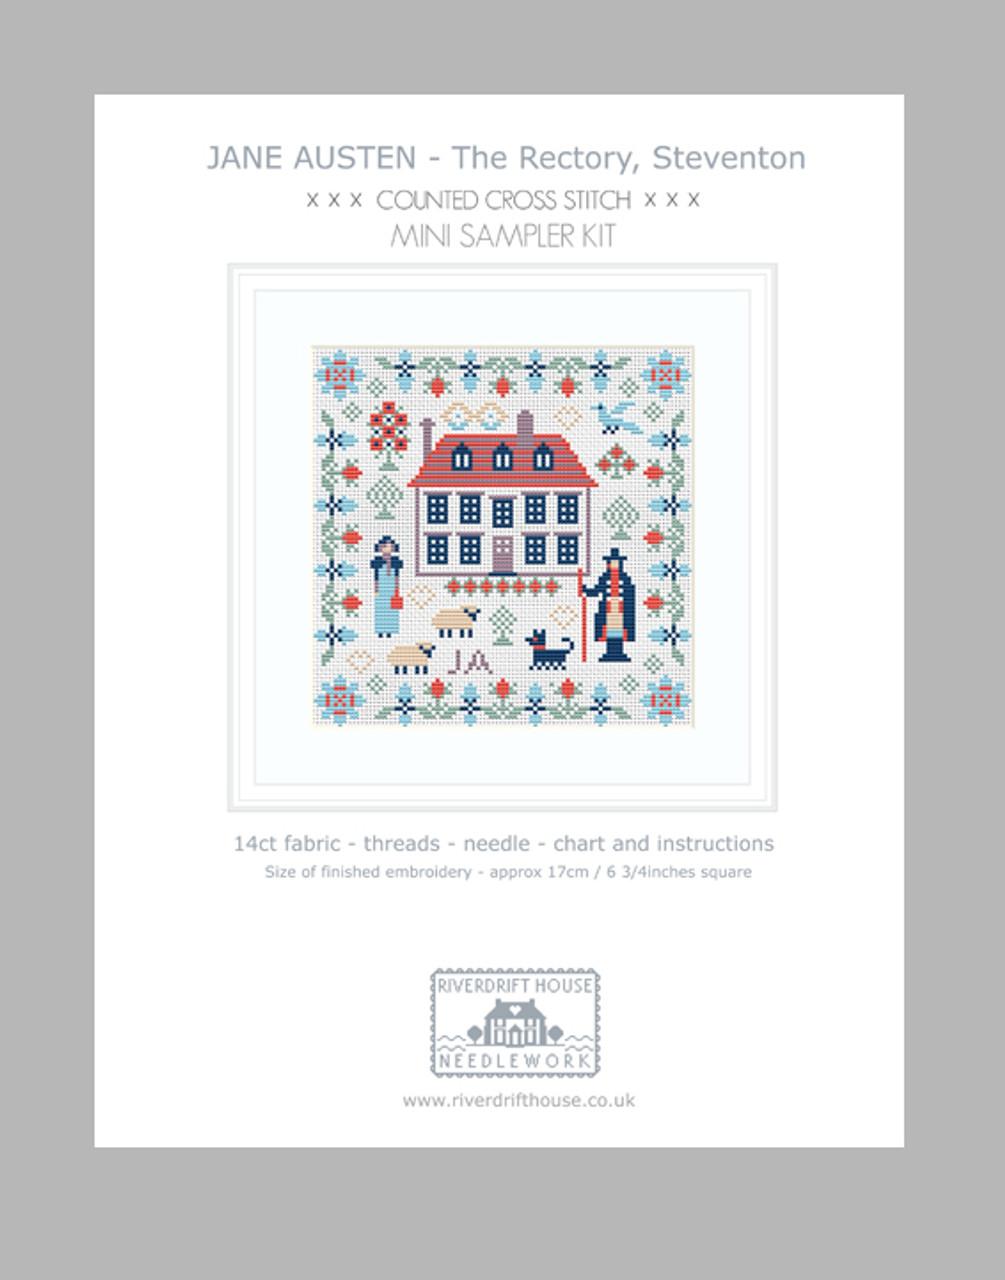 Aida Version CROSS STITCH KIT Jane Austen Sampler by Riverdrift House